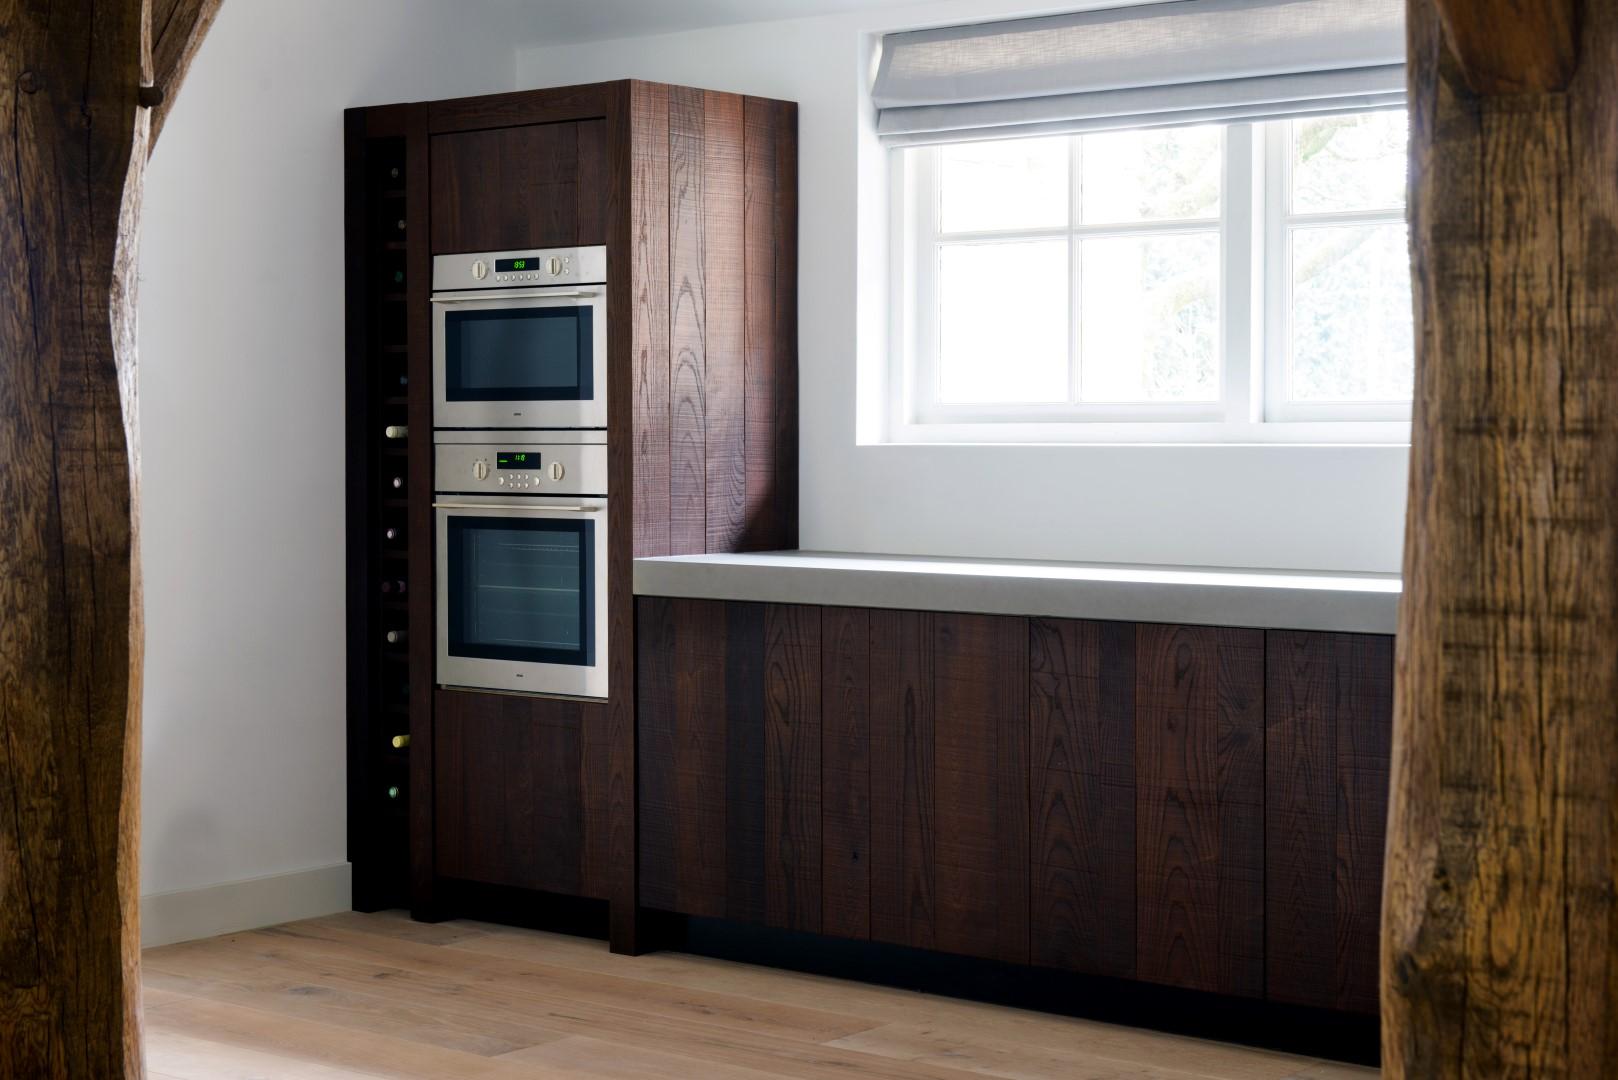 Moderne Keukens Belgie : Moderne houten keukens van JP Walker - Nieuws ...